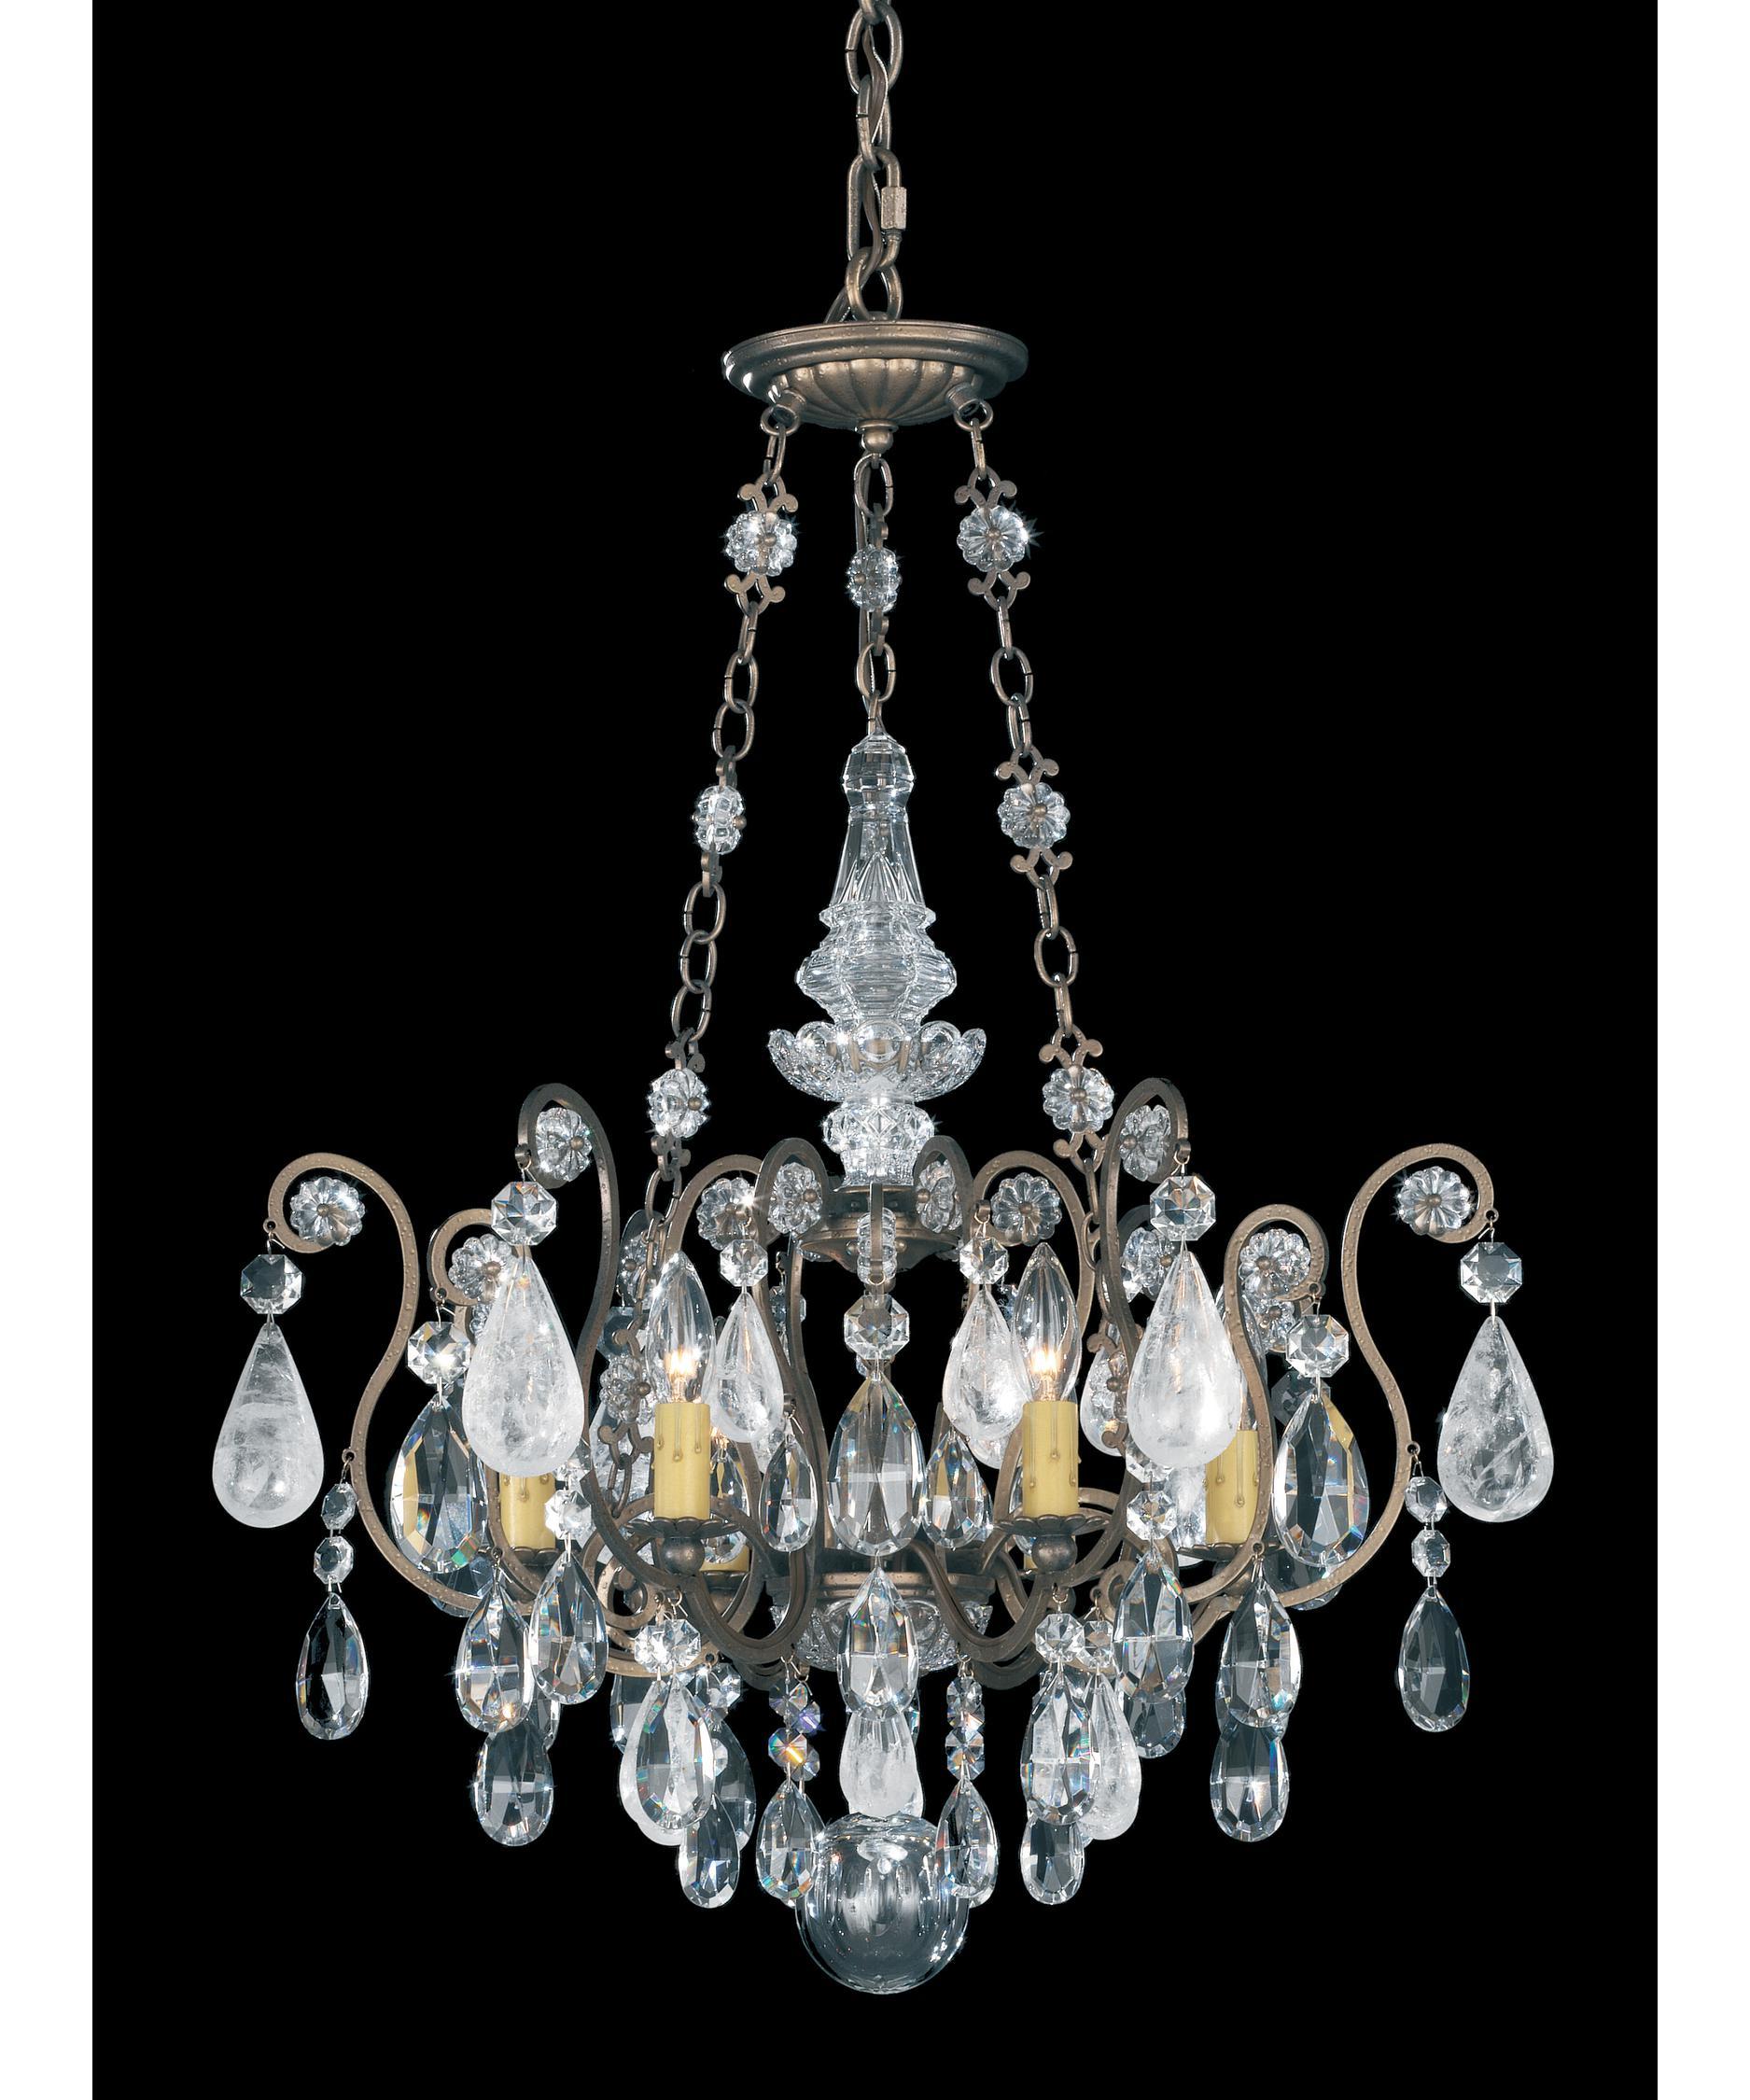 Schonbek Renaissance Rock Crystal 22 Inch Wide 6 Light Chandelier – Rock Crystal Chandelier